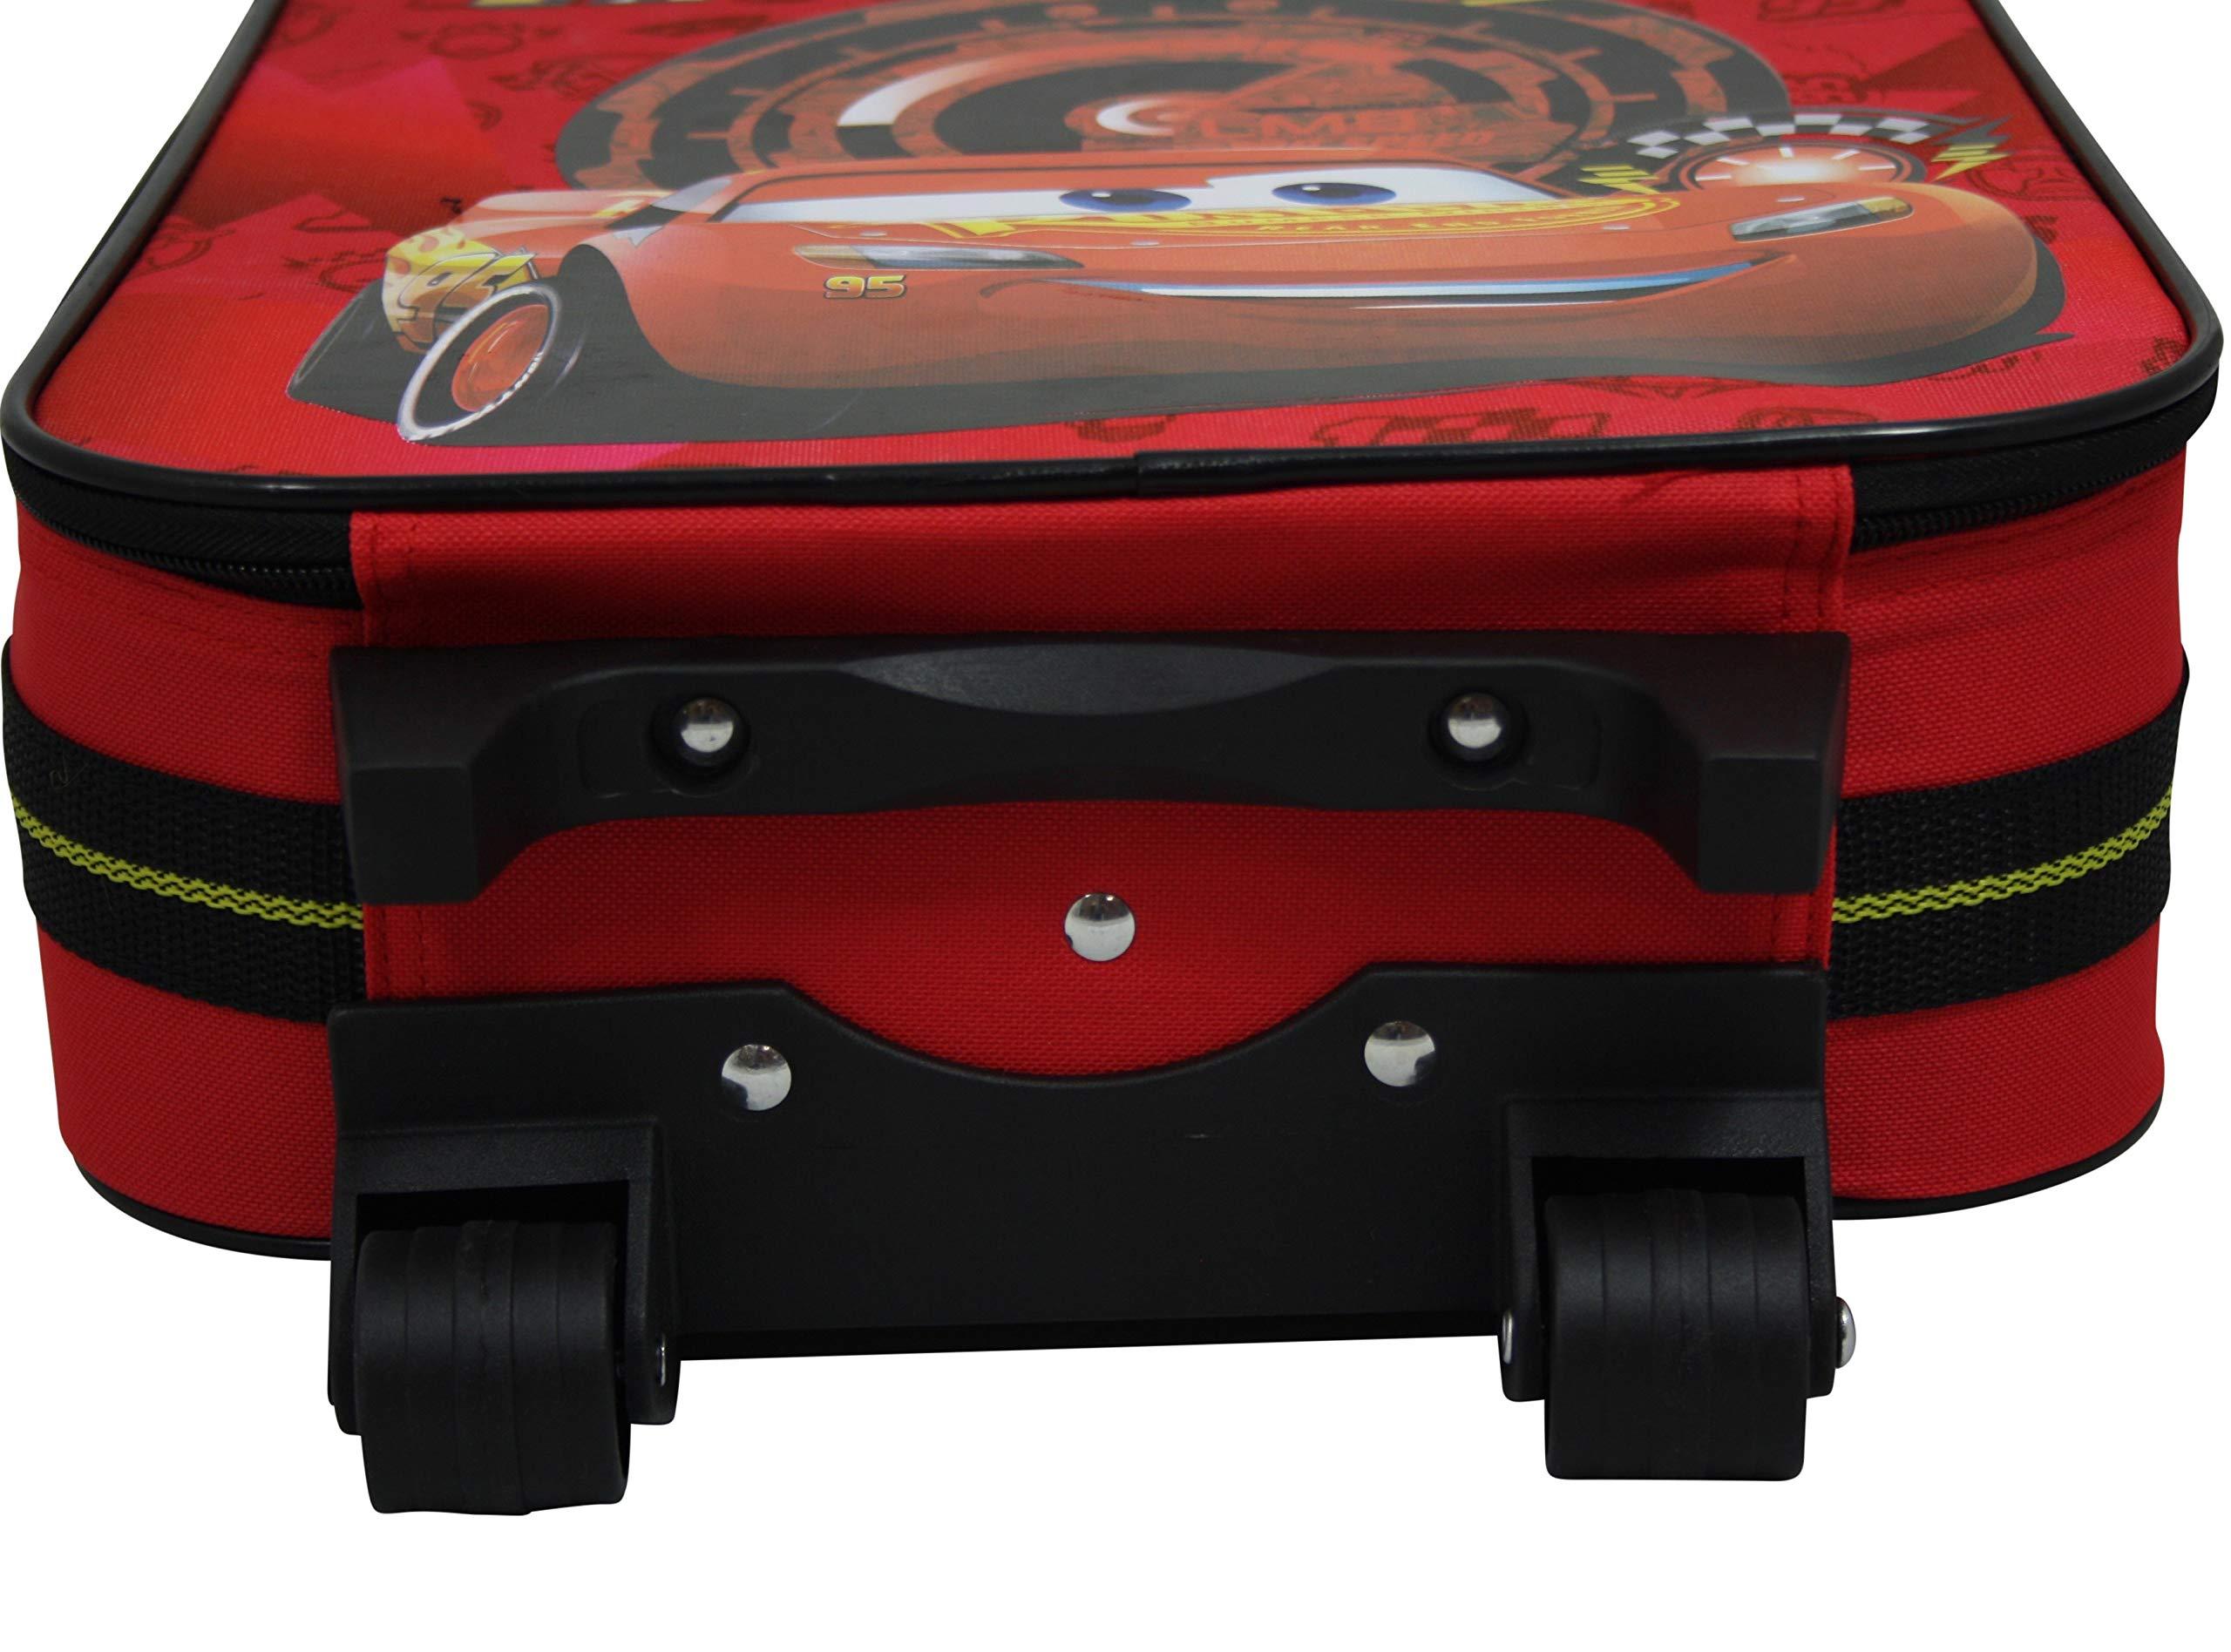 Disney-Cars-Koffer-Trolley-Kinderkoffer-Reisekoffer-Auto-McQueen-Handgepck-8111